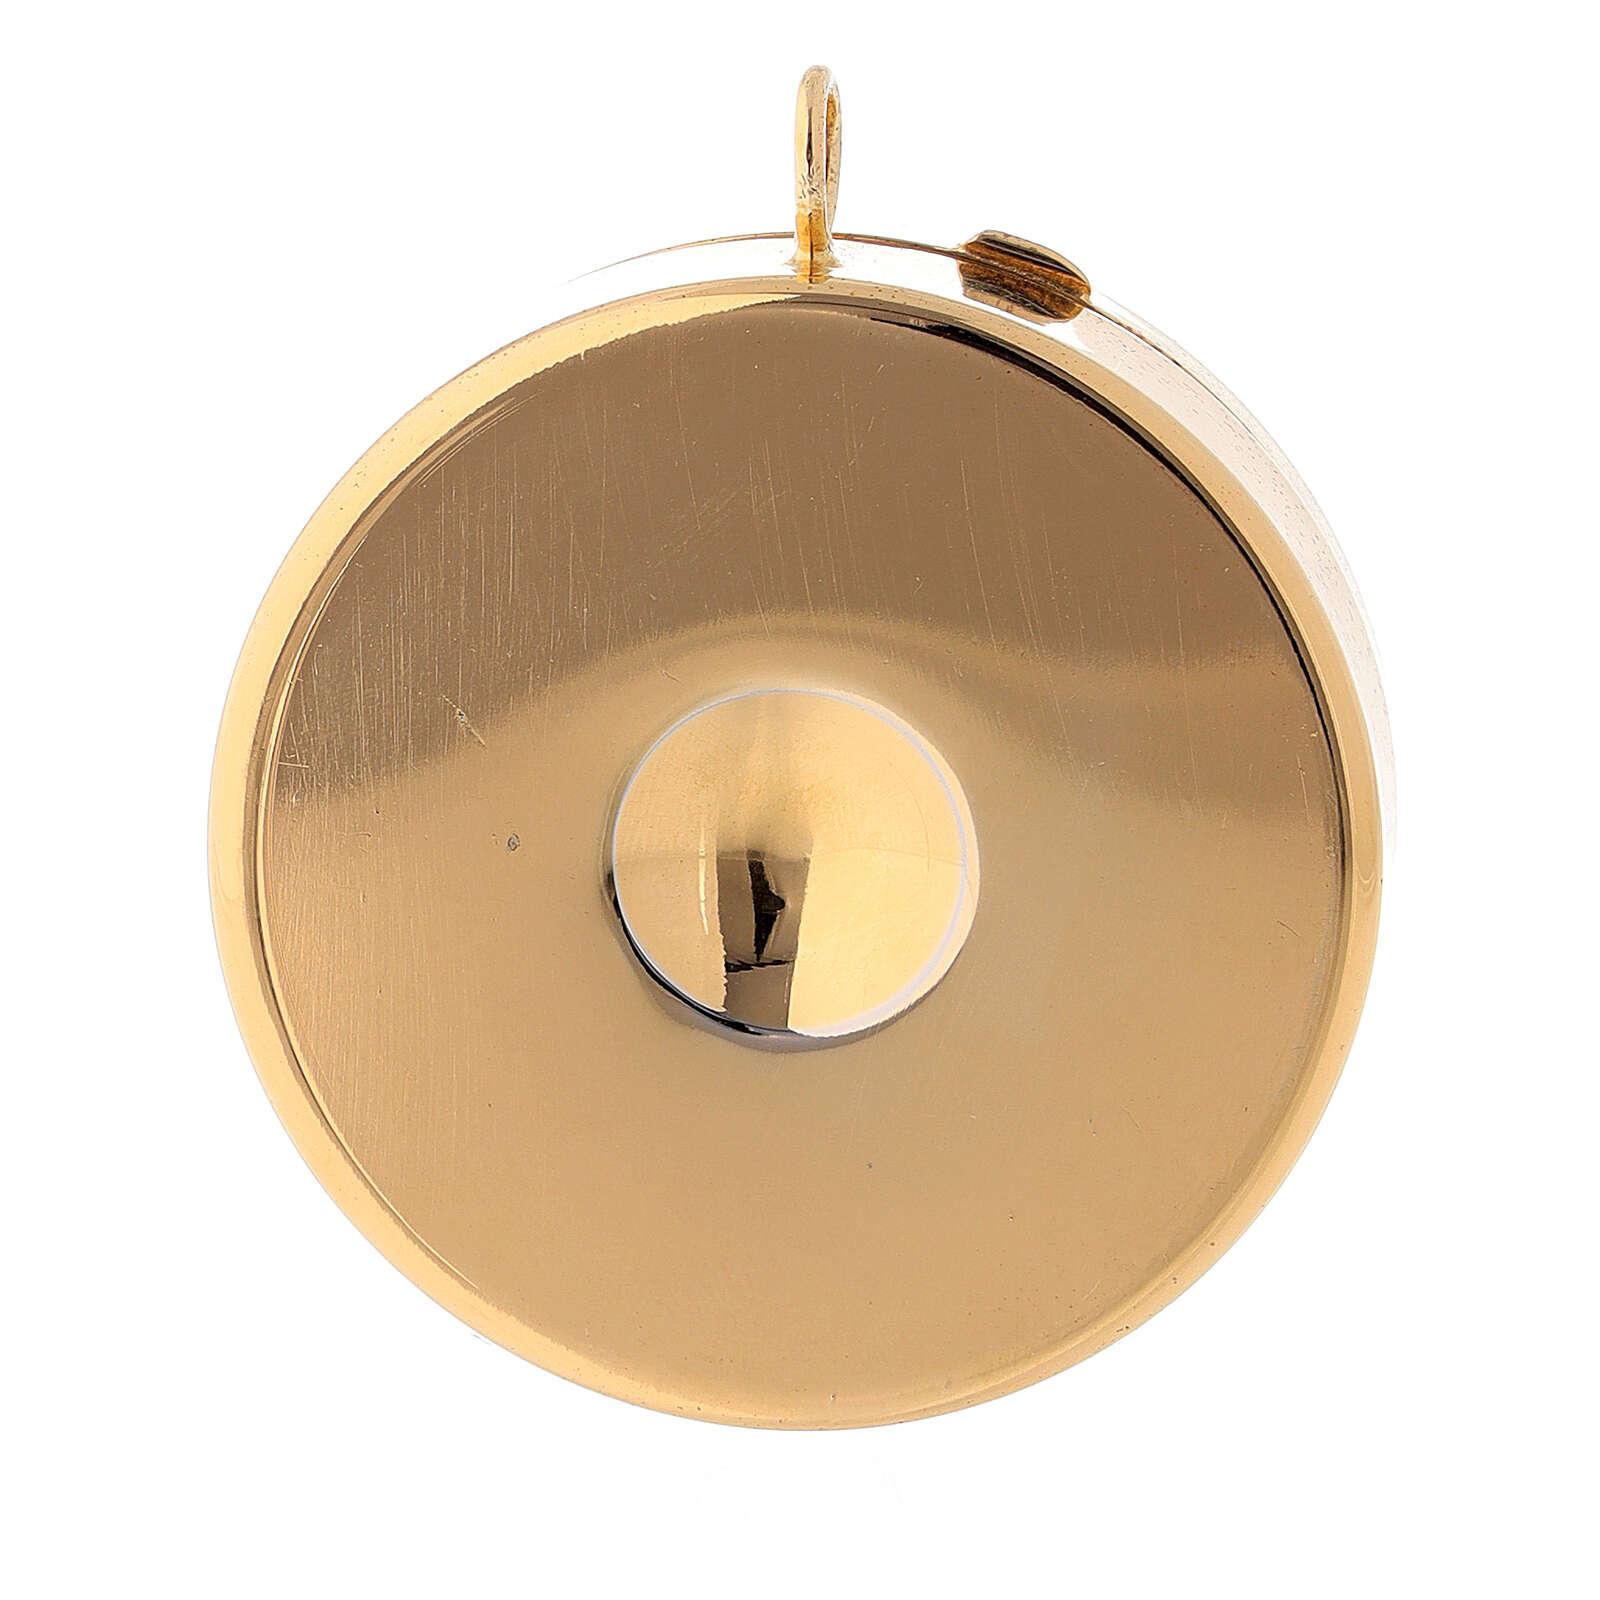 Caixa para hóstias IHS esmalte prata 800 dourado 3